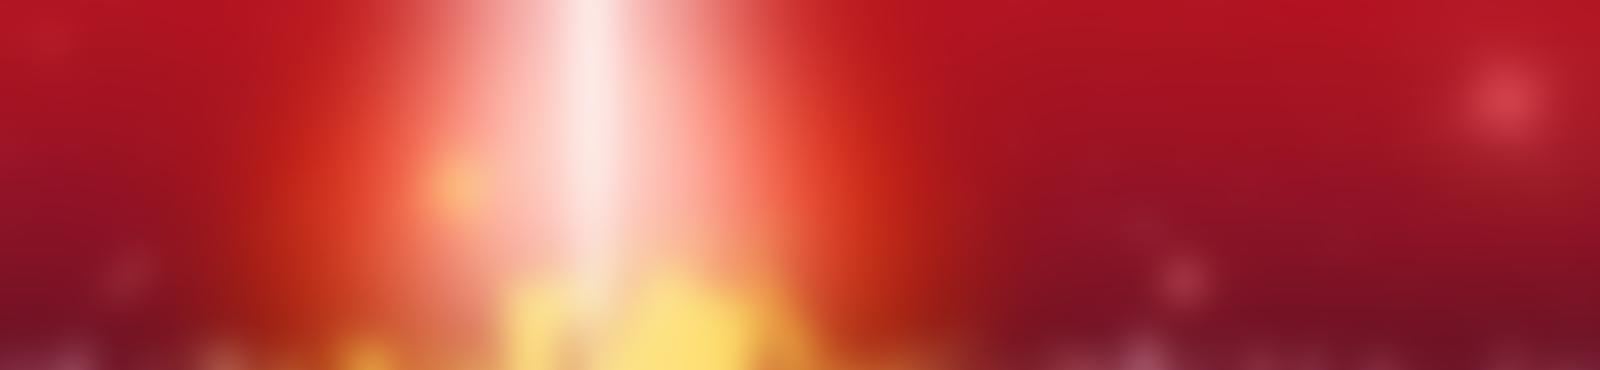 Blurred b2d5c01d ceb7 4001 8cc1 d8cfc63e04c2